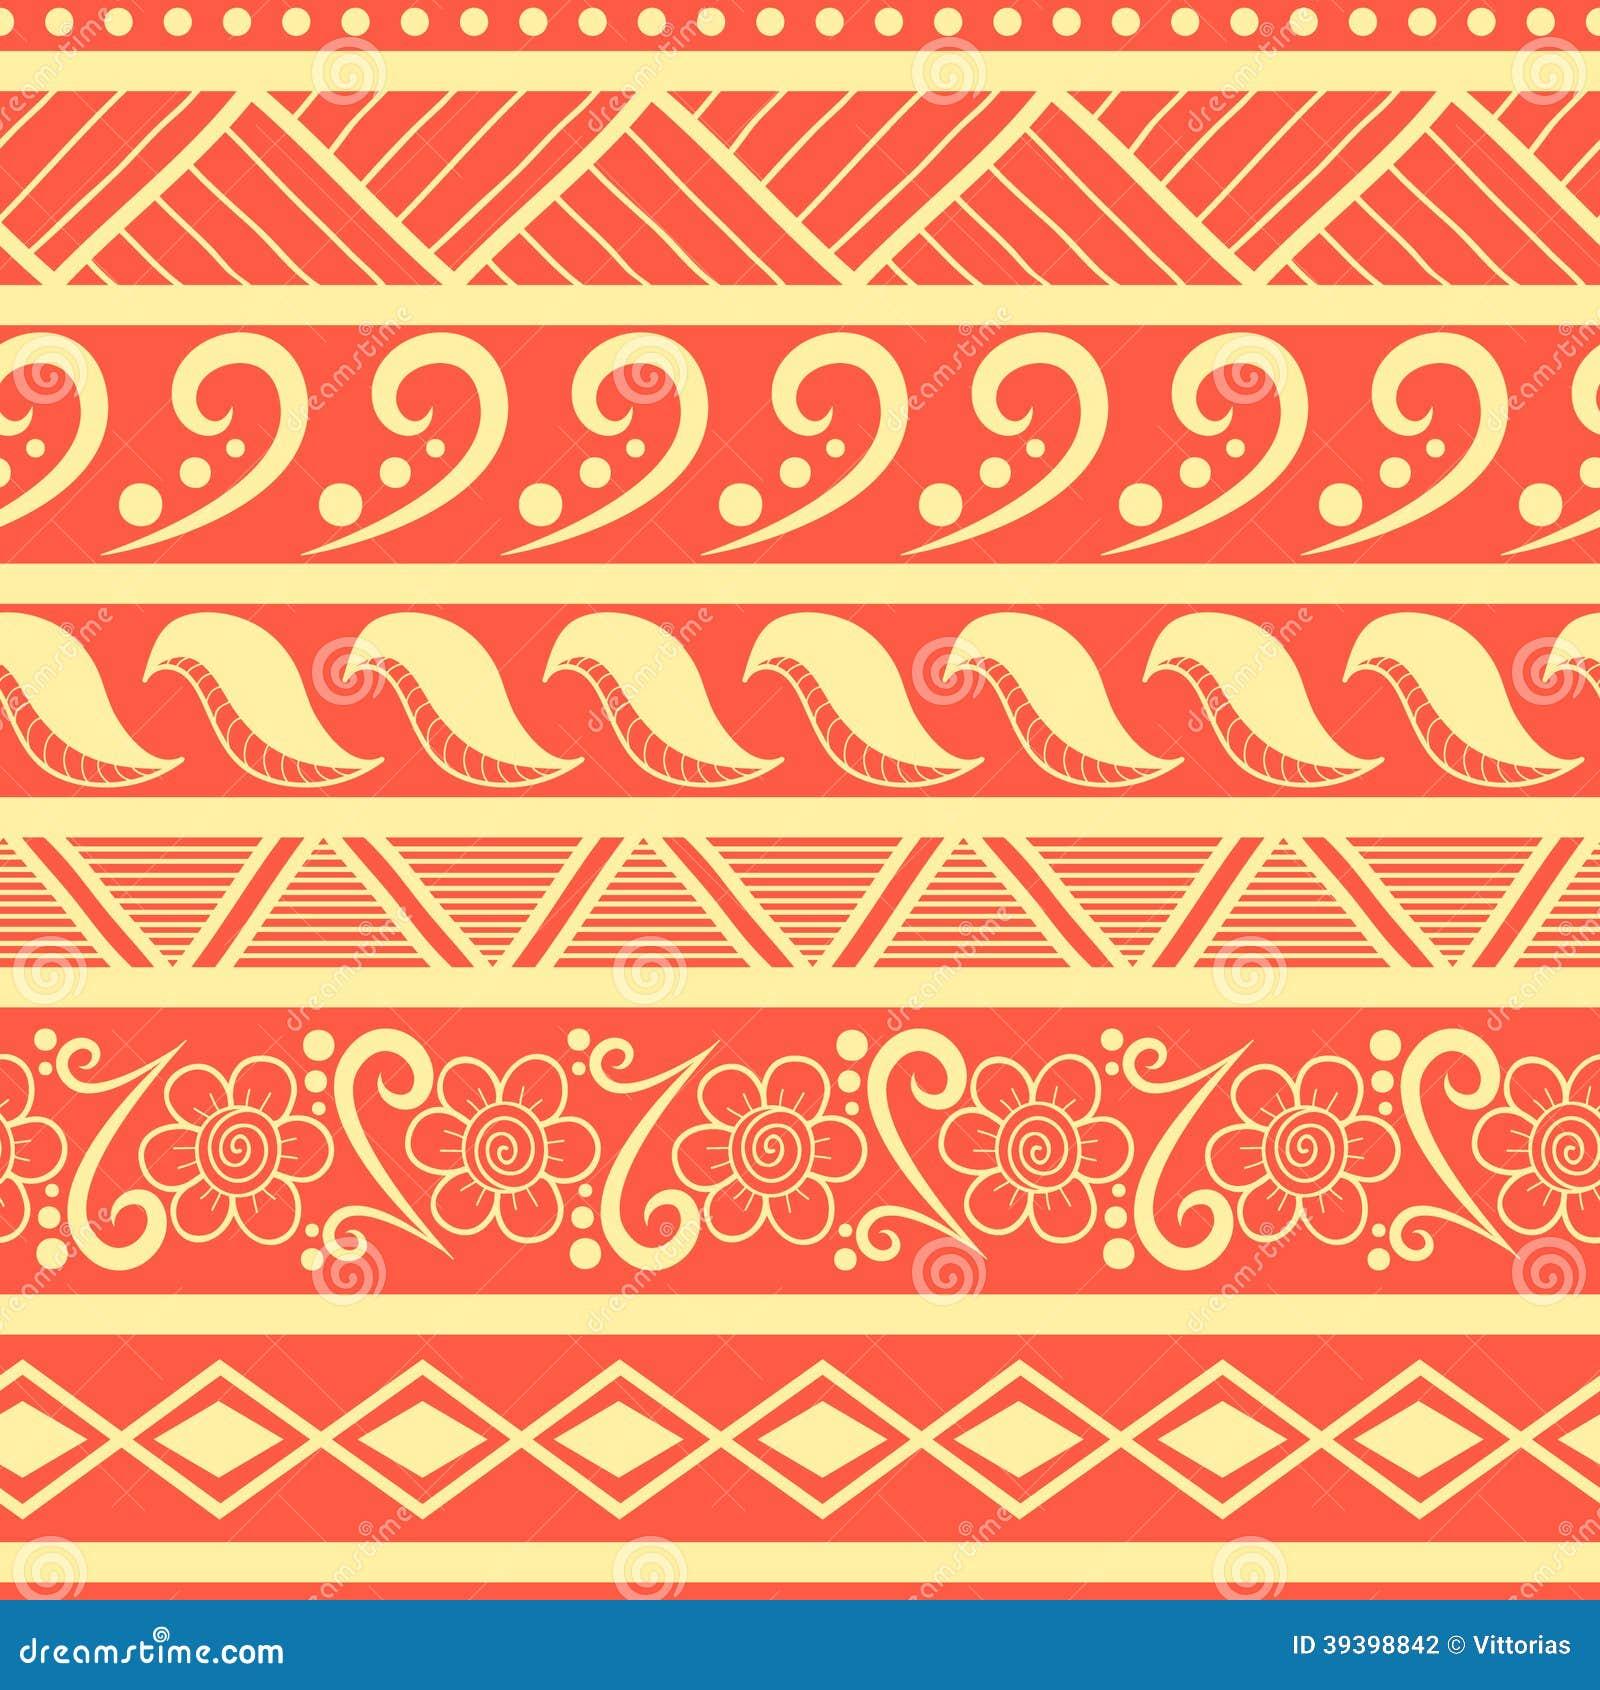 aztec designs and patterns wwwimgkidcom the image